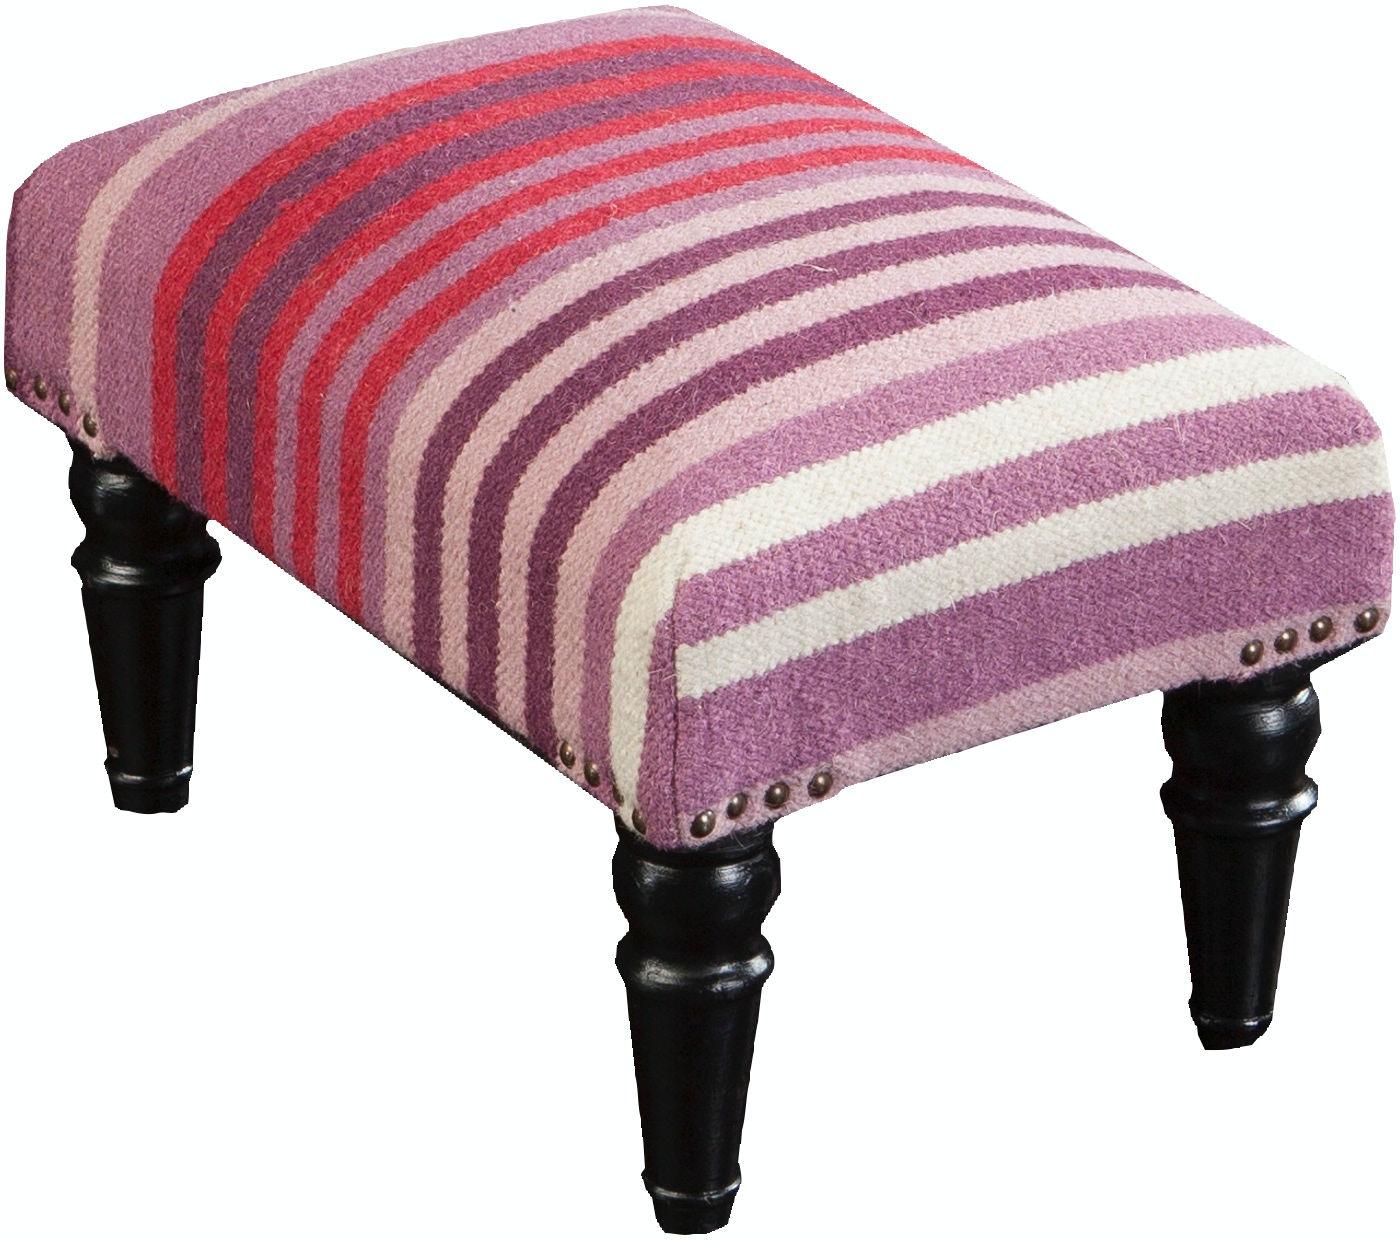 Living Room 12 X 18 living room stools - good's furniture - kewanee, il